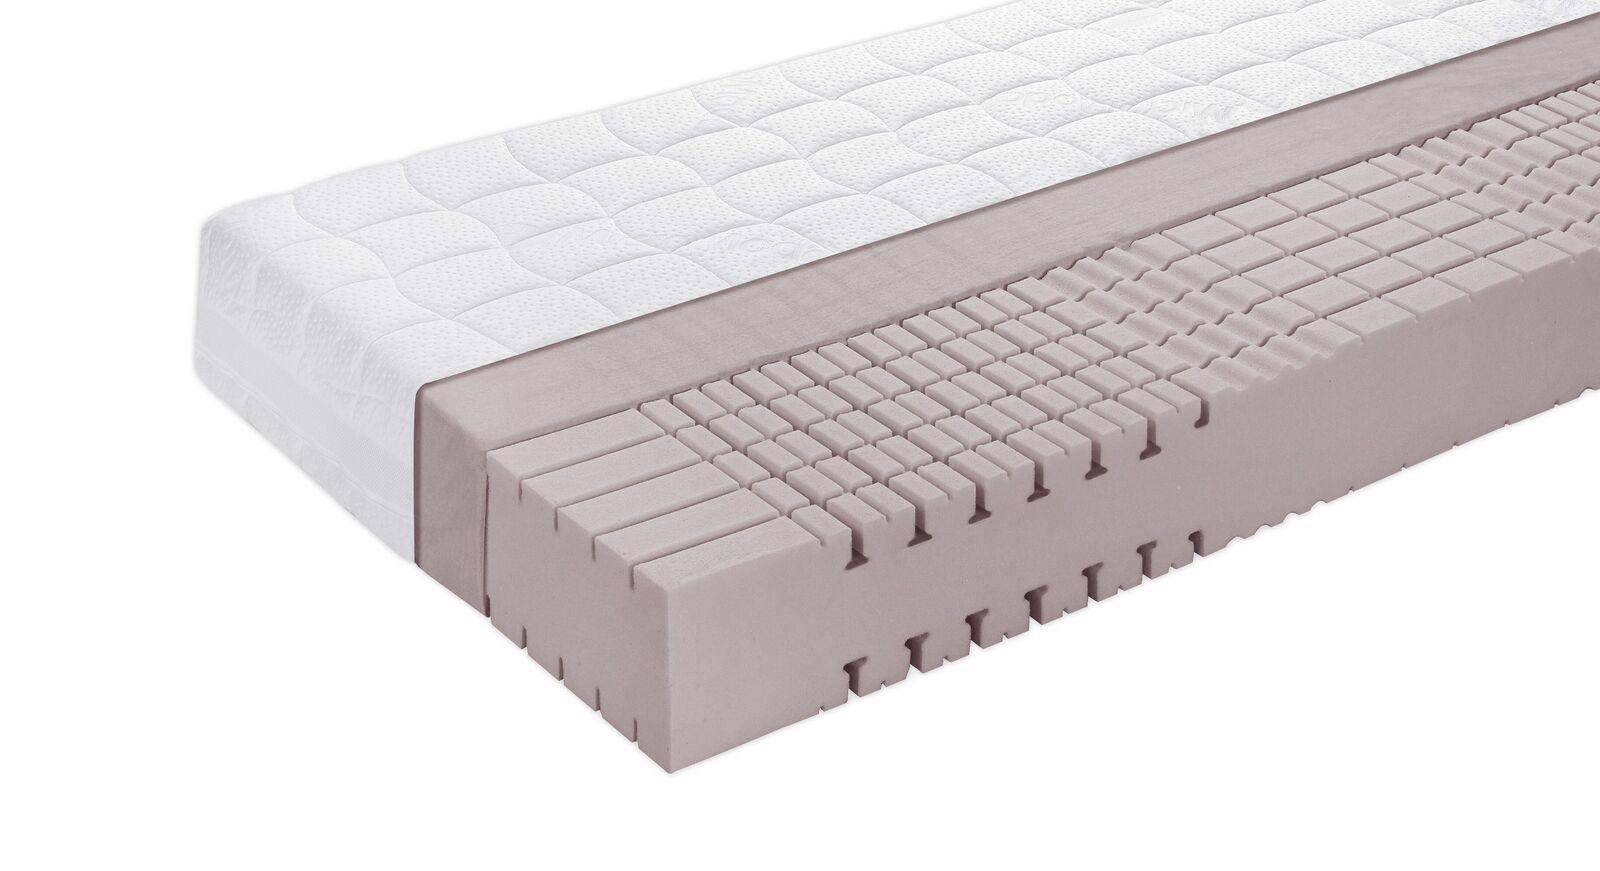 Kaltschaum-Matratze orthowell comfort mit 3D-Würfelschnitt